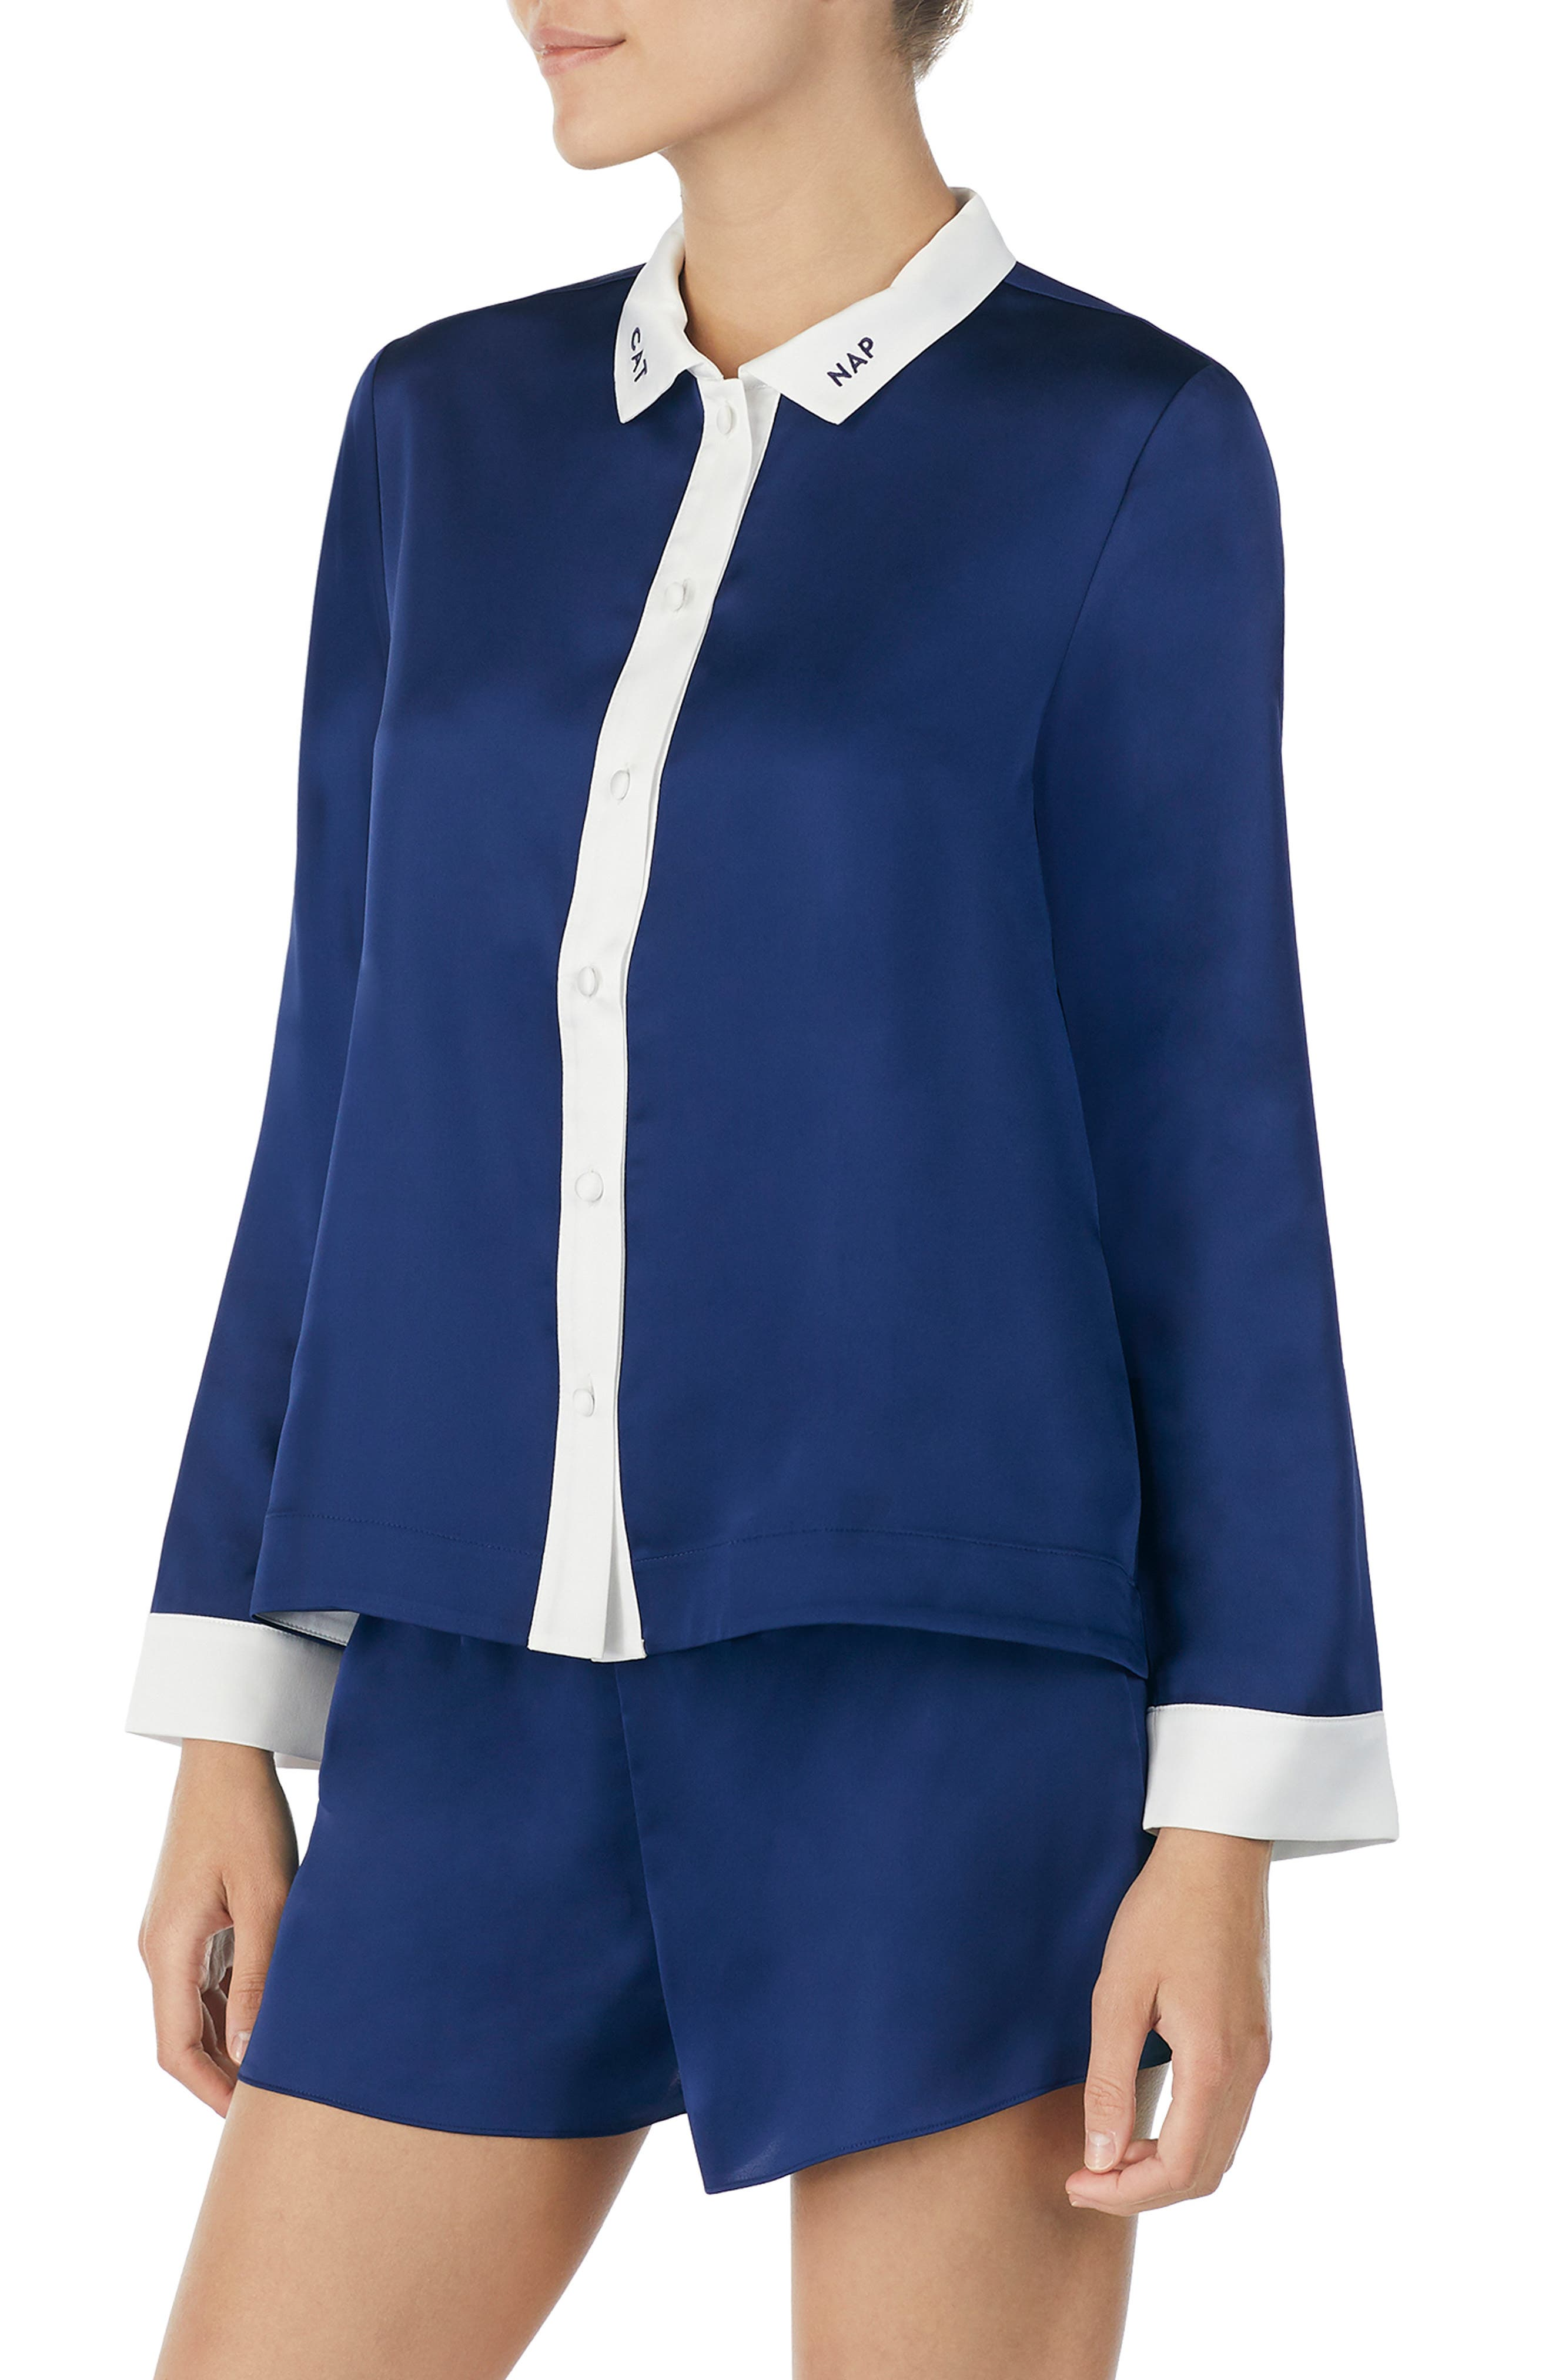 Kate Spade New York Short Pajamas & Eye Mask, Blue